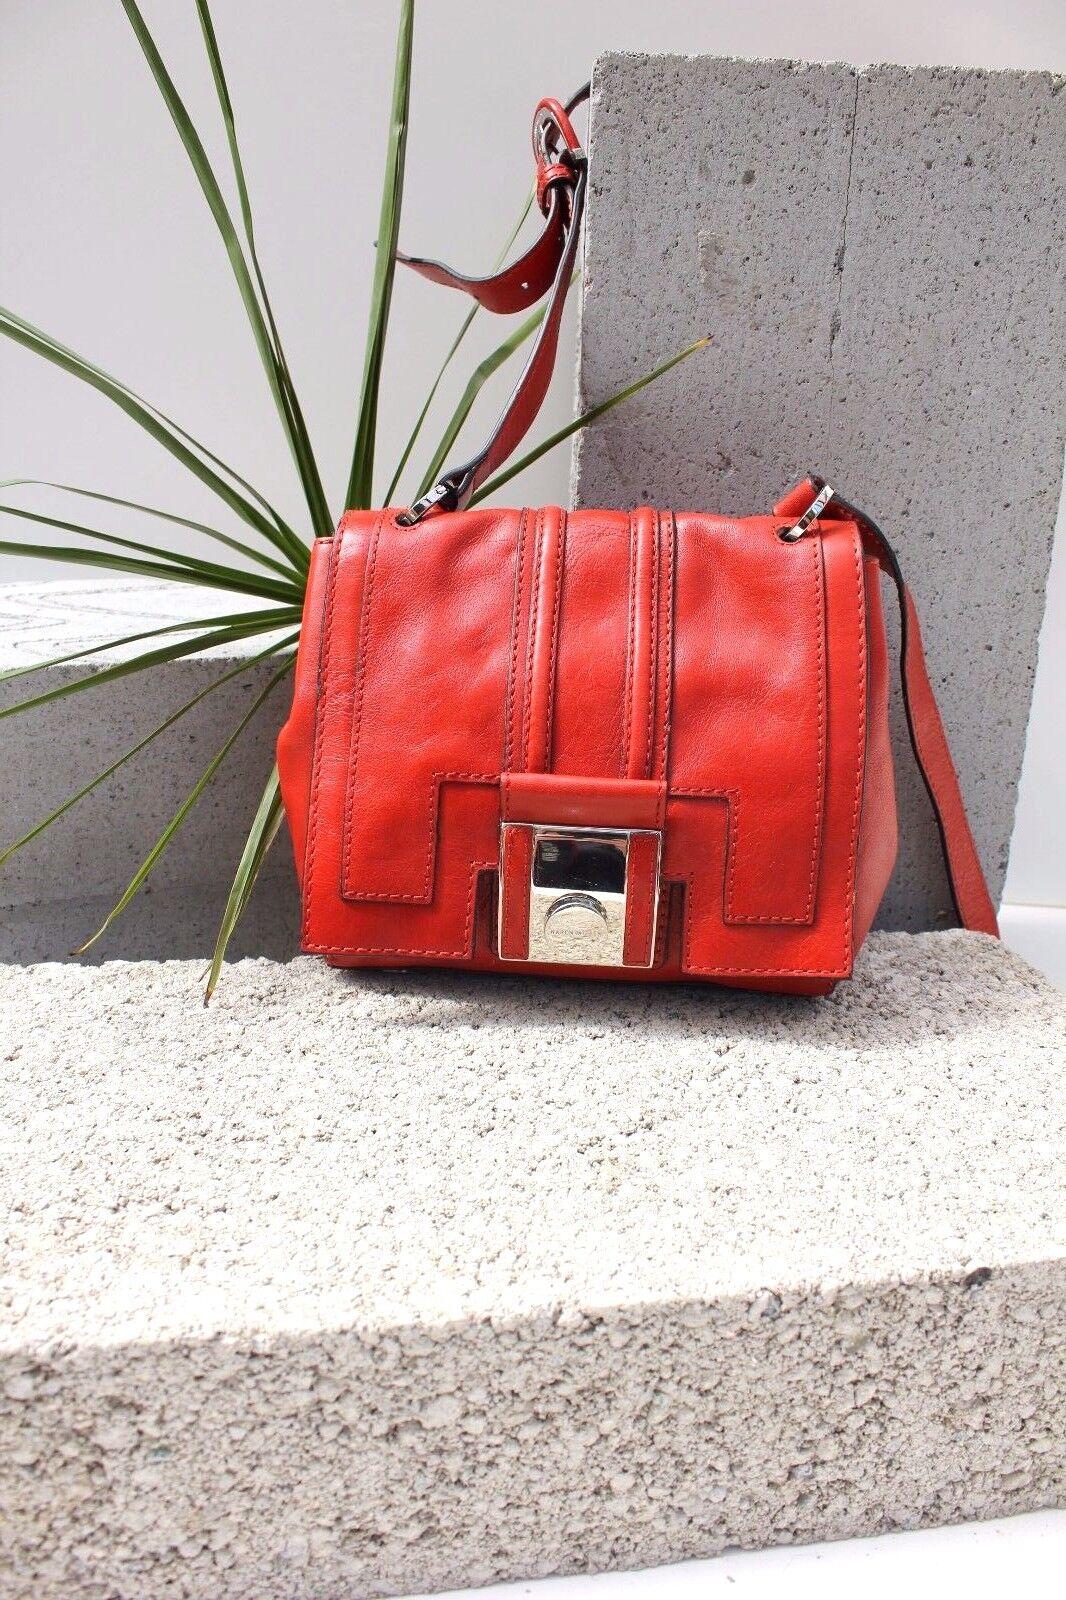 Karen Millen Gm161 Rotes Leder Umhängetasche Umhängetasche Umhängetasche Umhängetasche Riemen Handtasche   Förderung  78f602